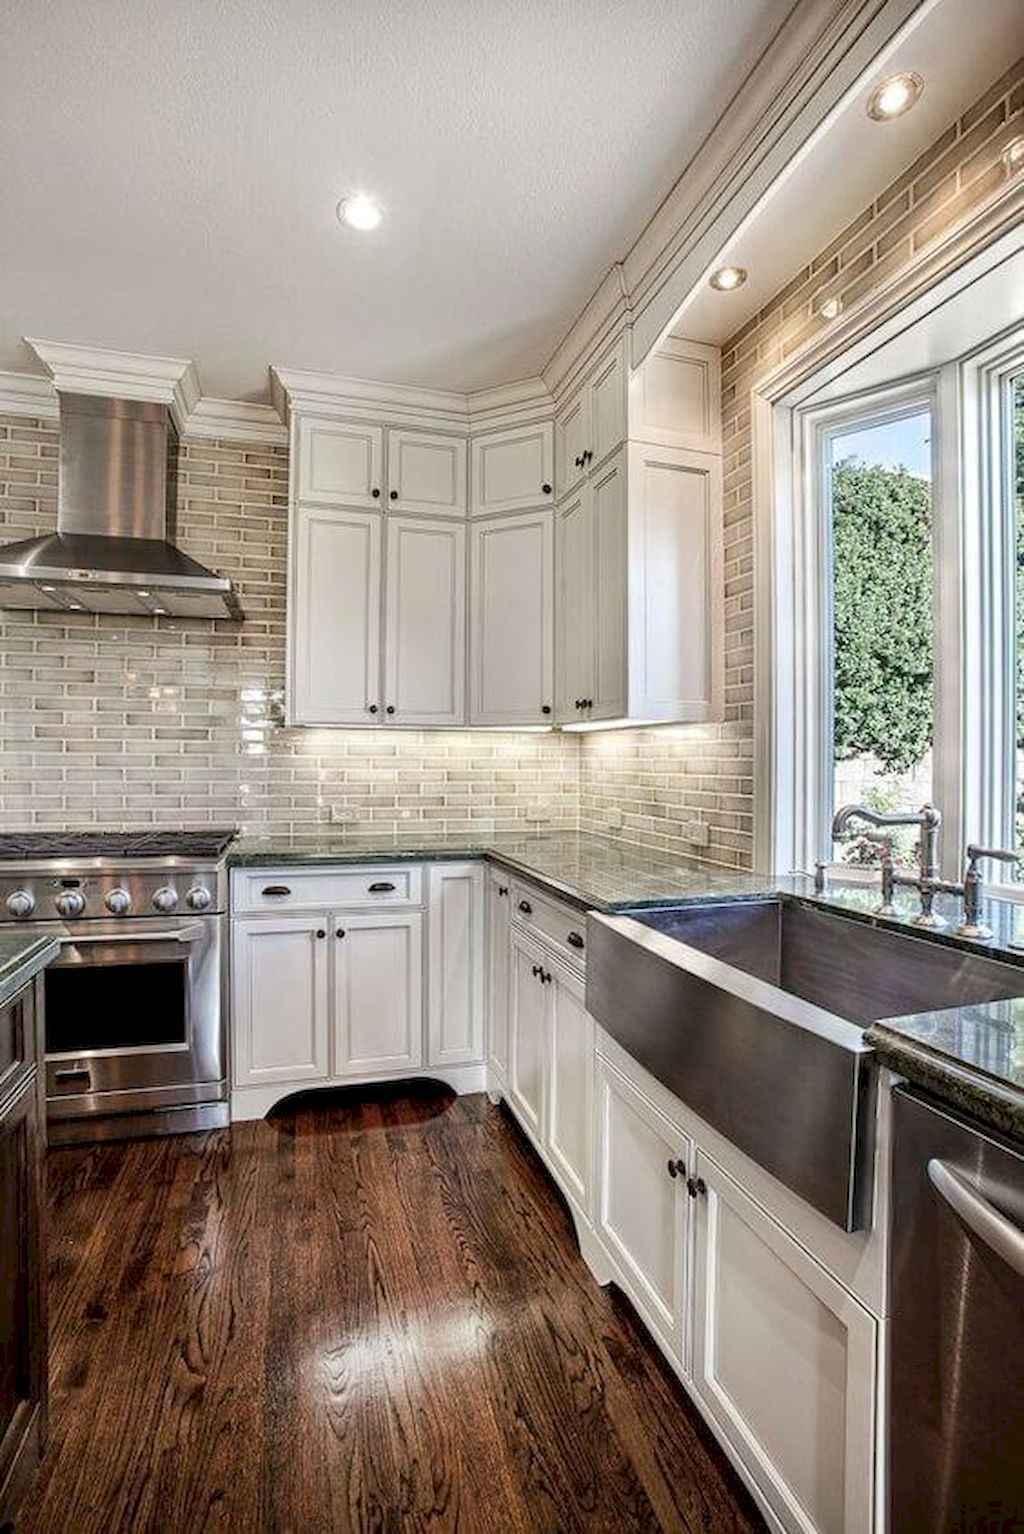 60 fancy farmhouse kitchen backsplash decor ideas 5 for Fancy kitchen decor